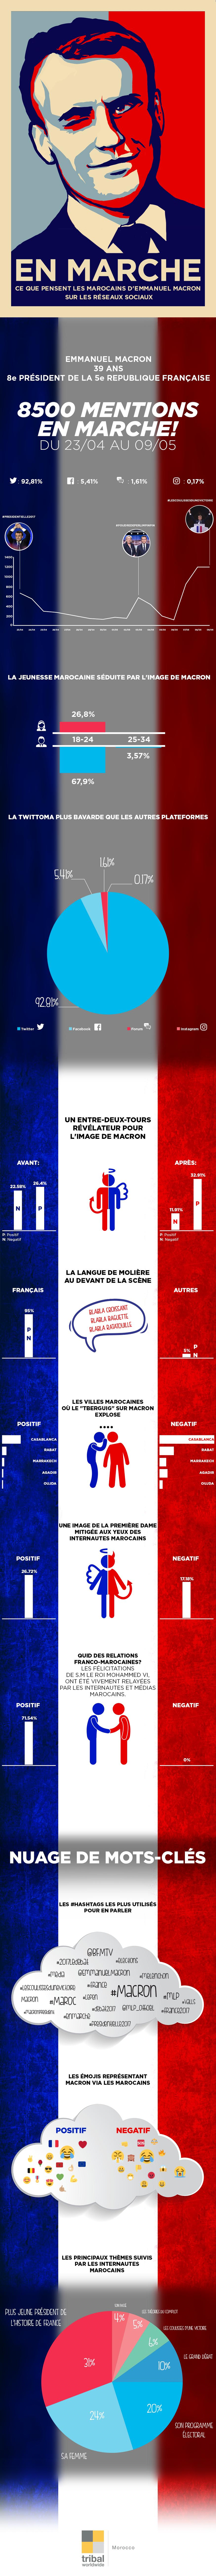 Ce que pensent les marocains d'Emmanuel Macron